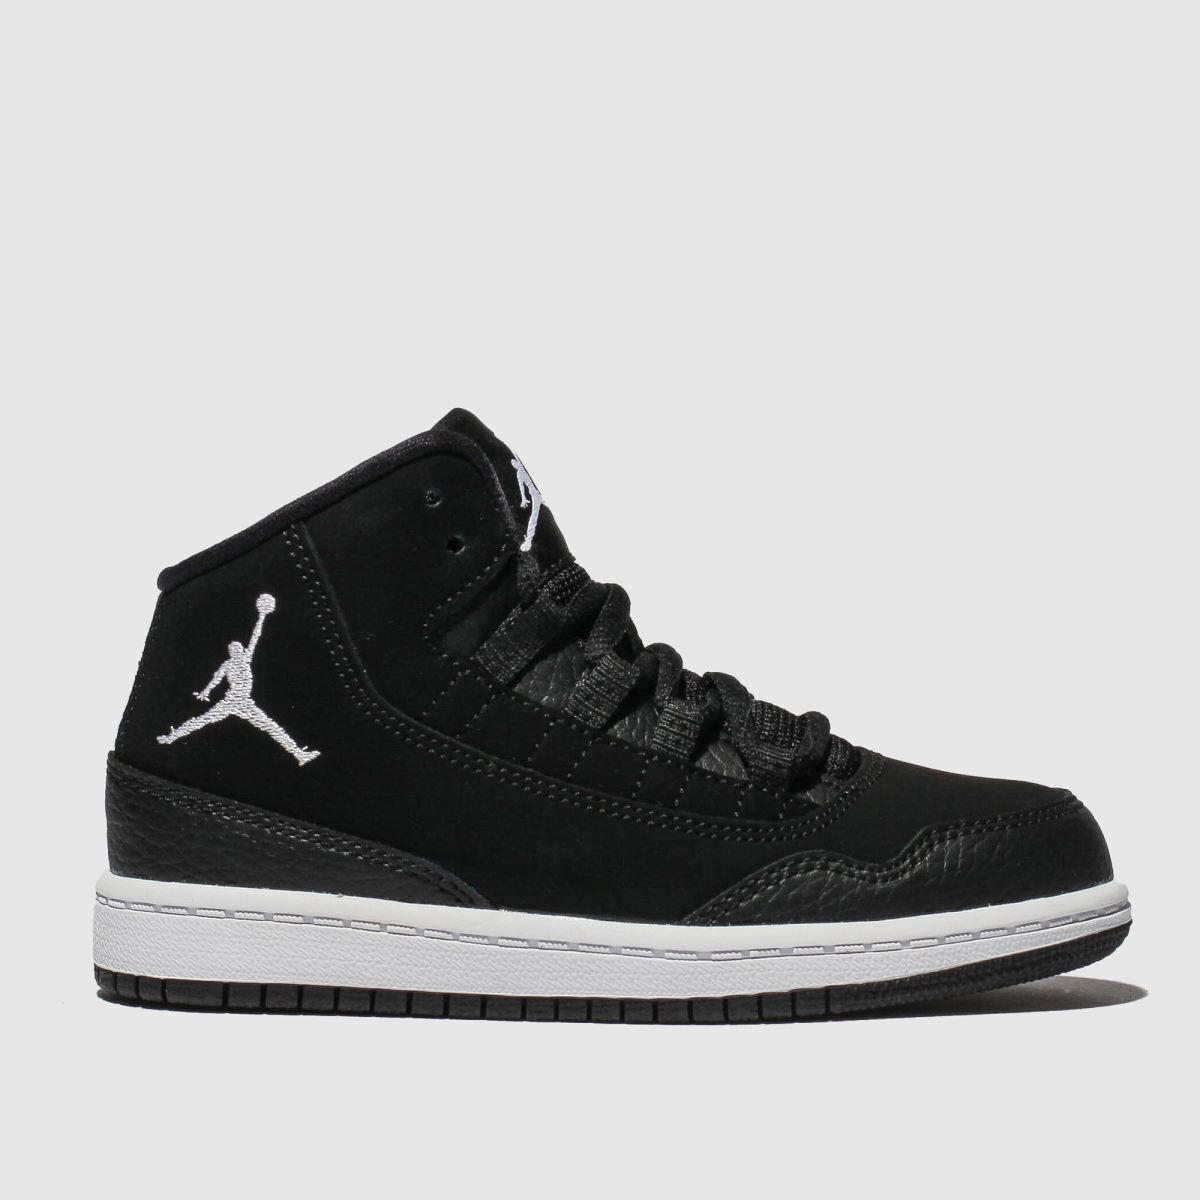 Nike Jordan Black & White Executive Trainers Junior